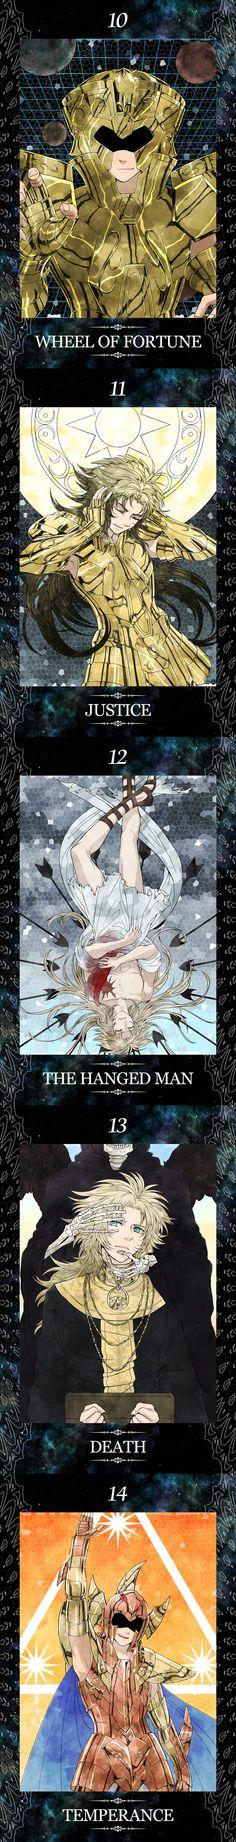 Part Three Saint Seiya Gemini Story Tarot Cards